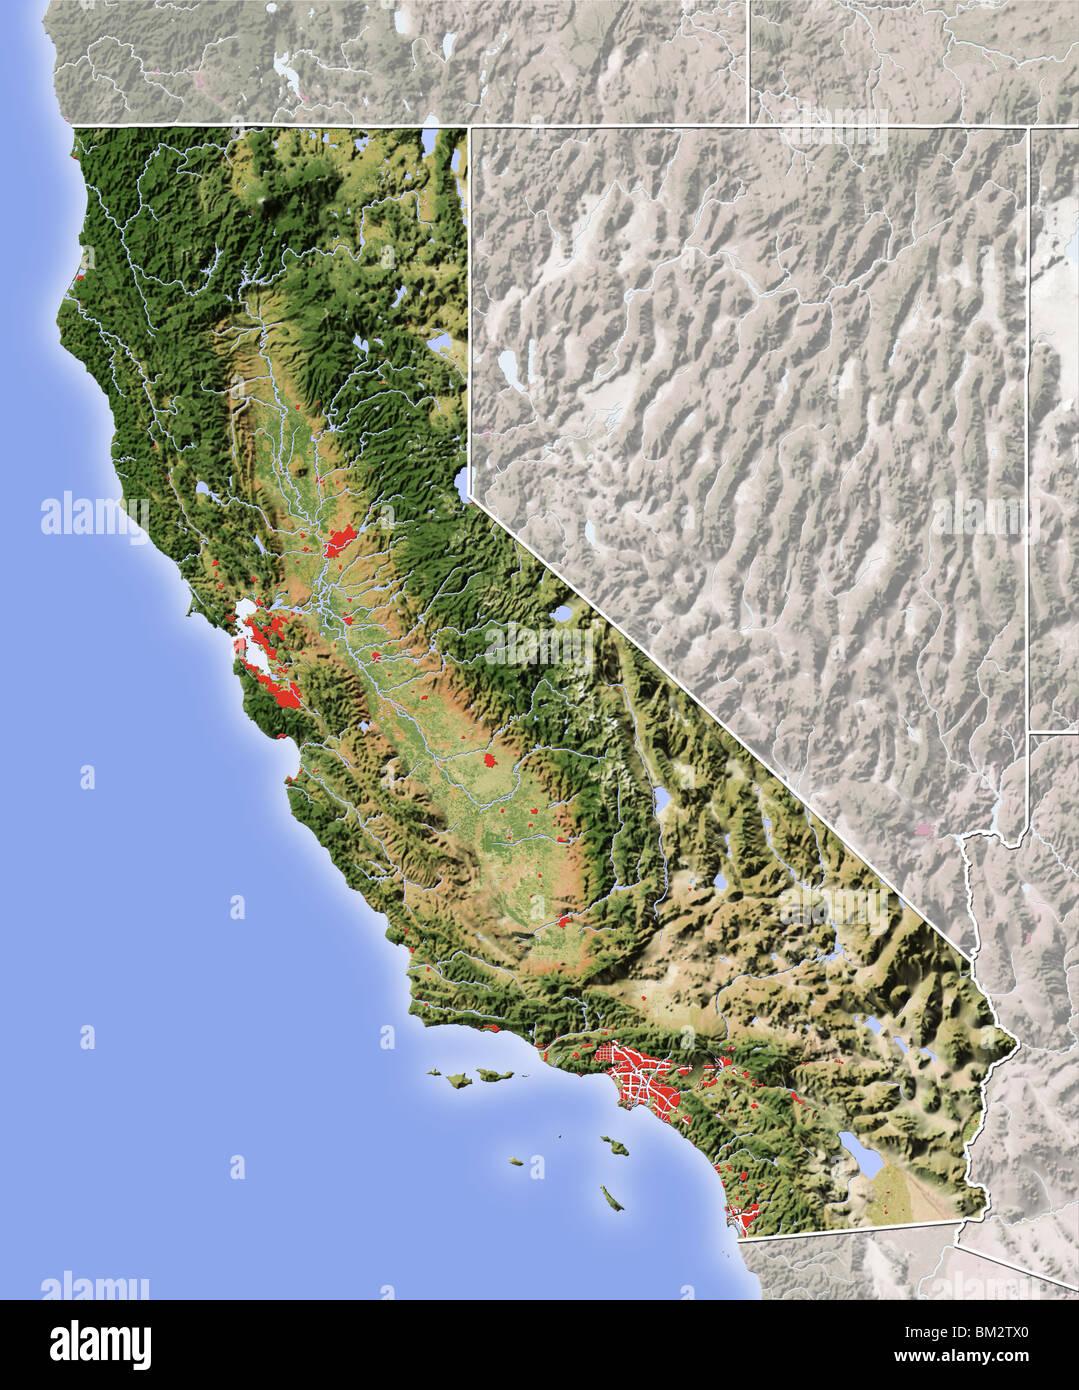 Physical Map Of California Stock Photos & Physical Map Of California ...